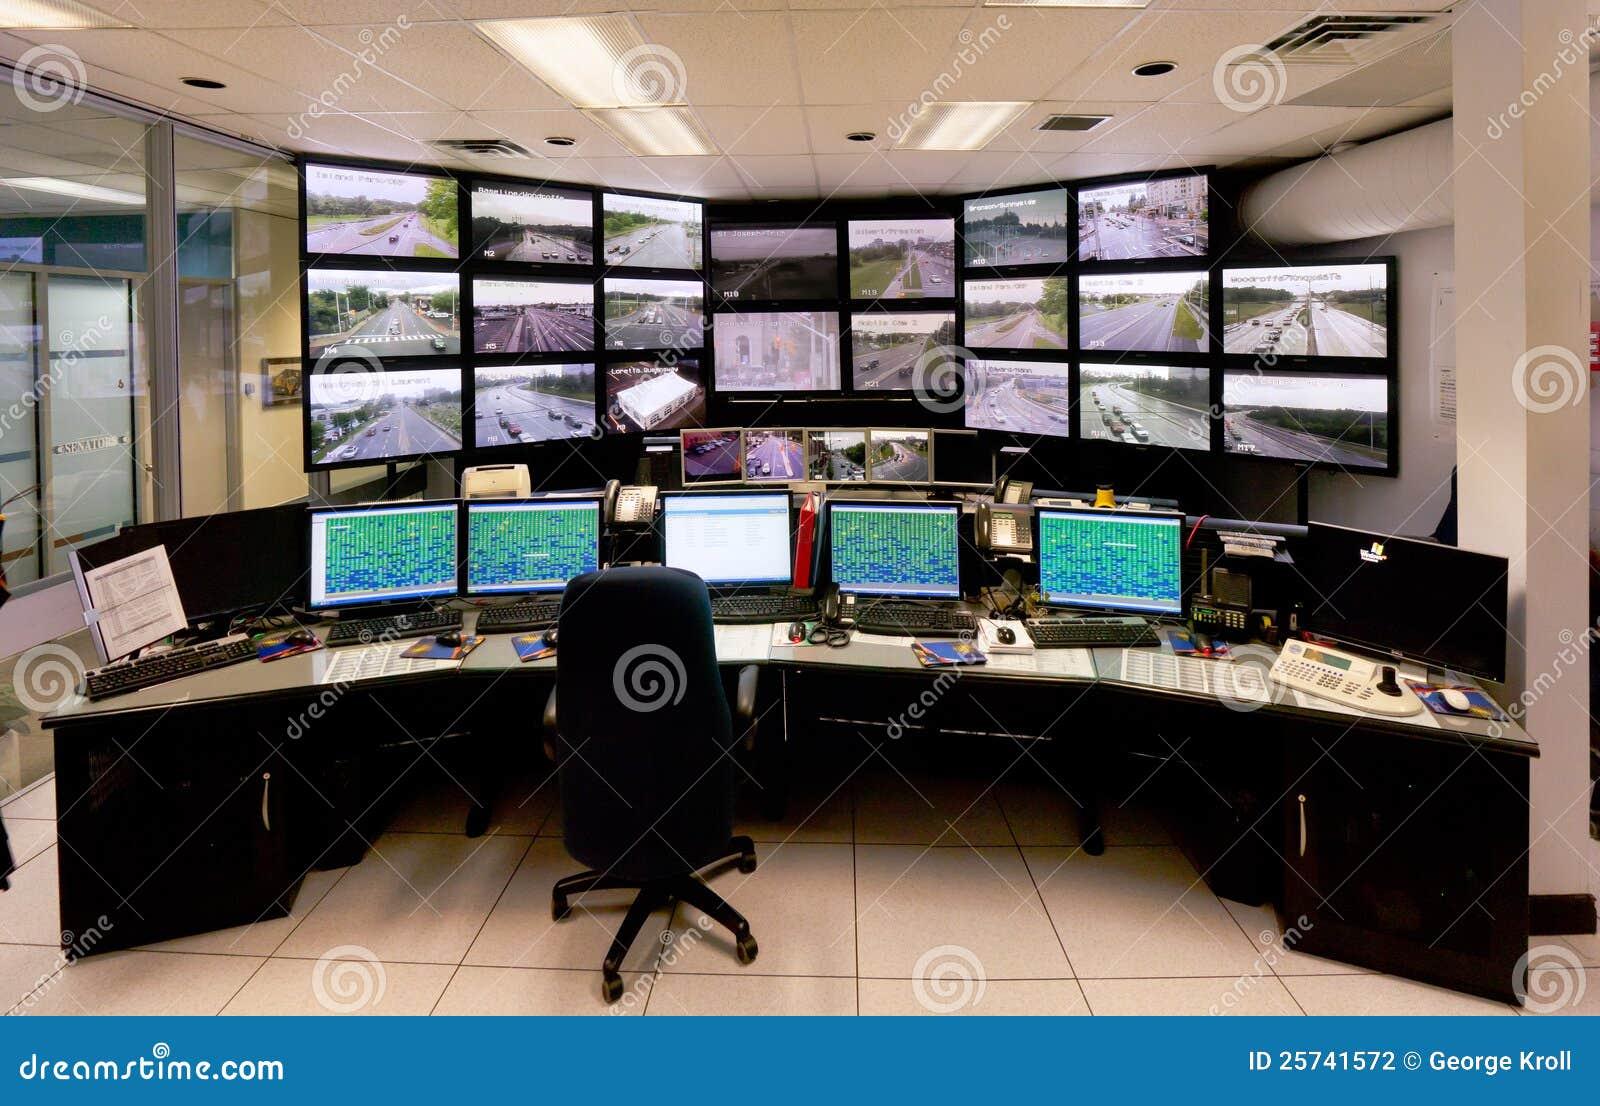 Center kommandokontrolltrafik